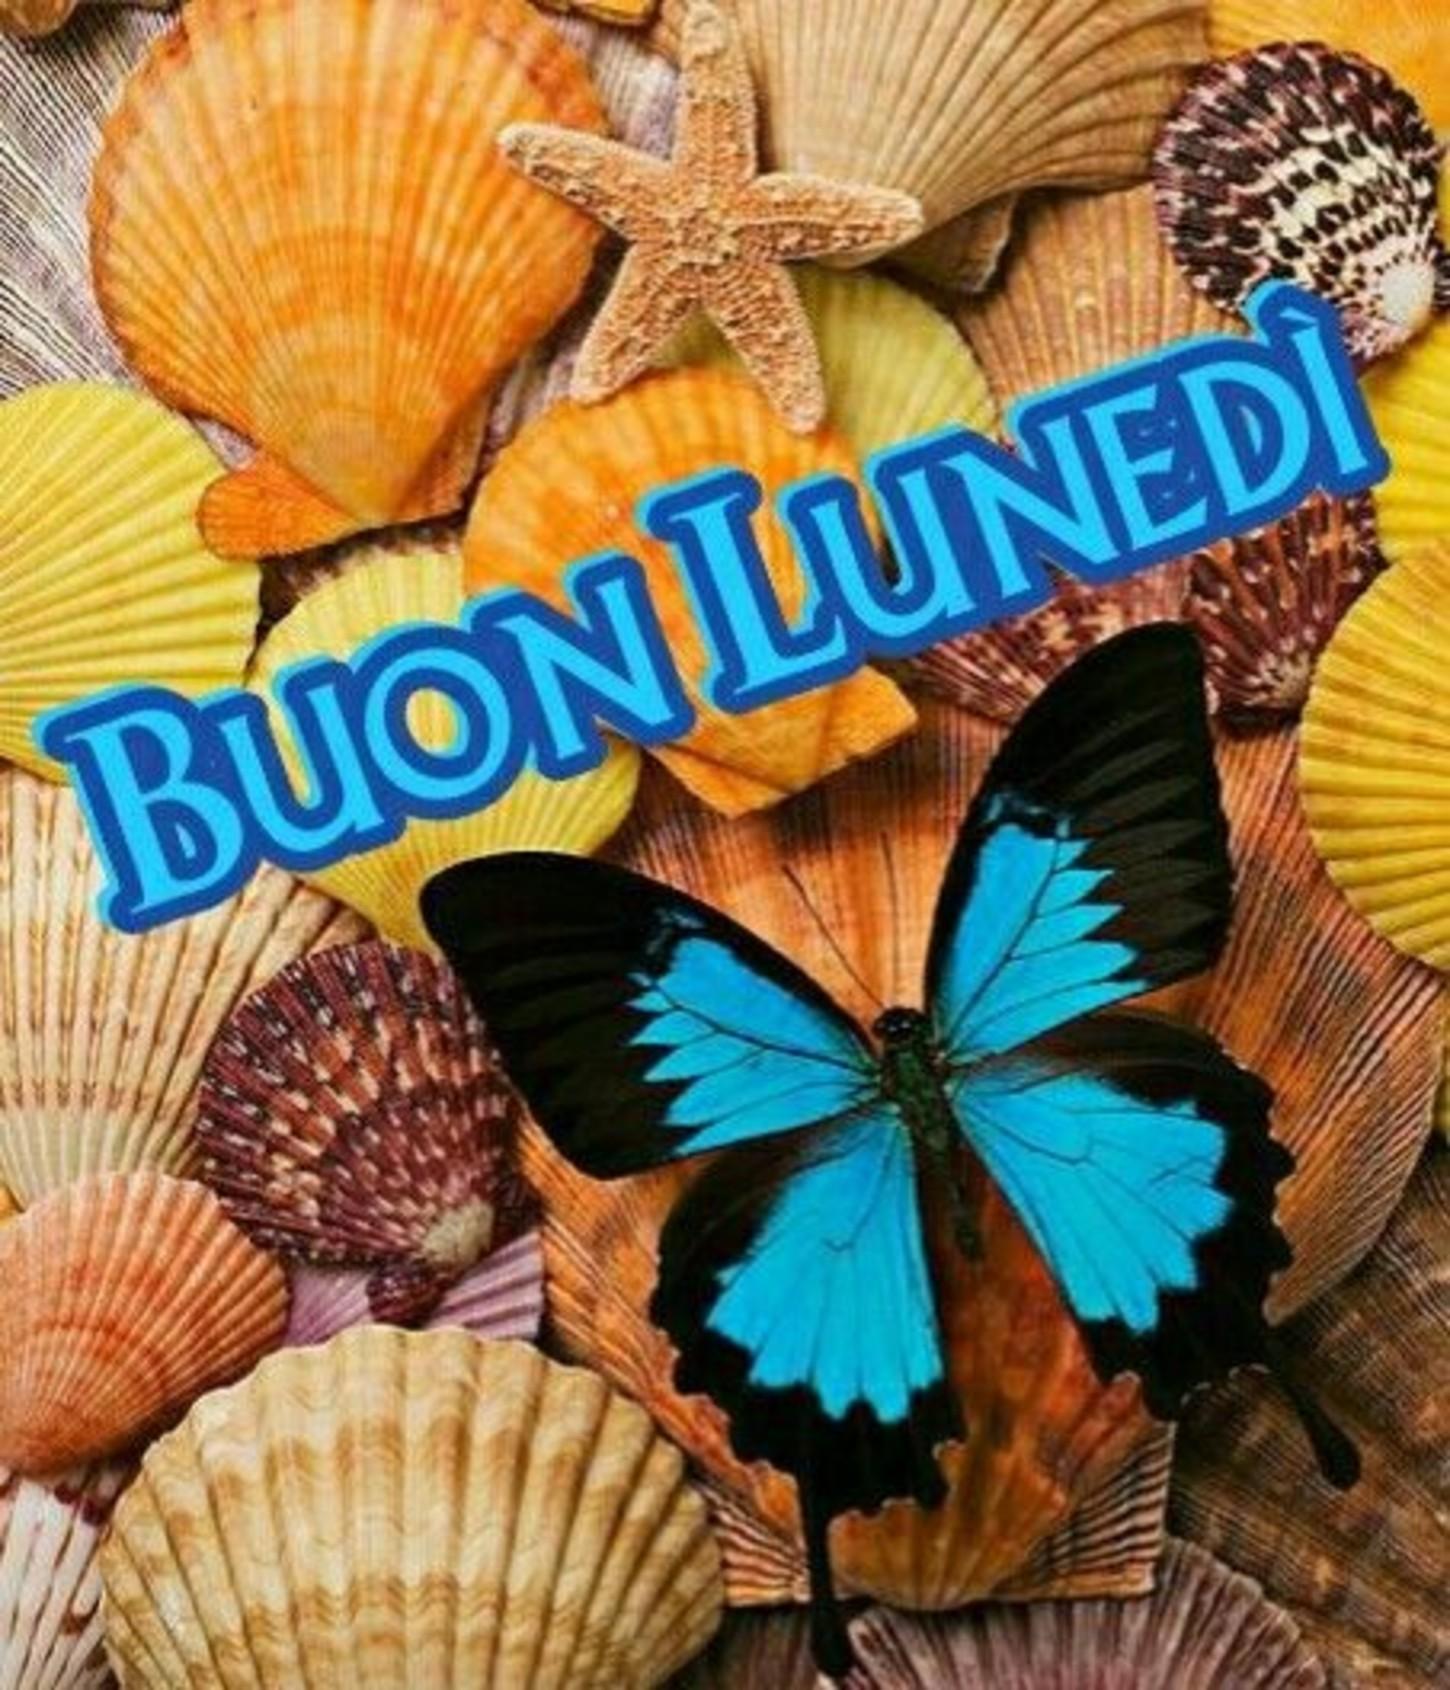 Buon Lunedì Farfalle Immaginifacebook It